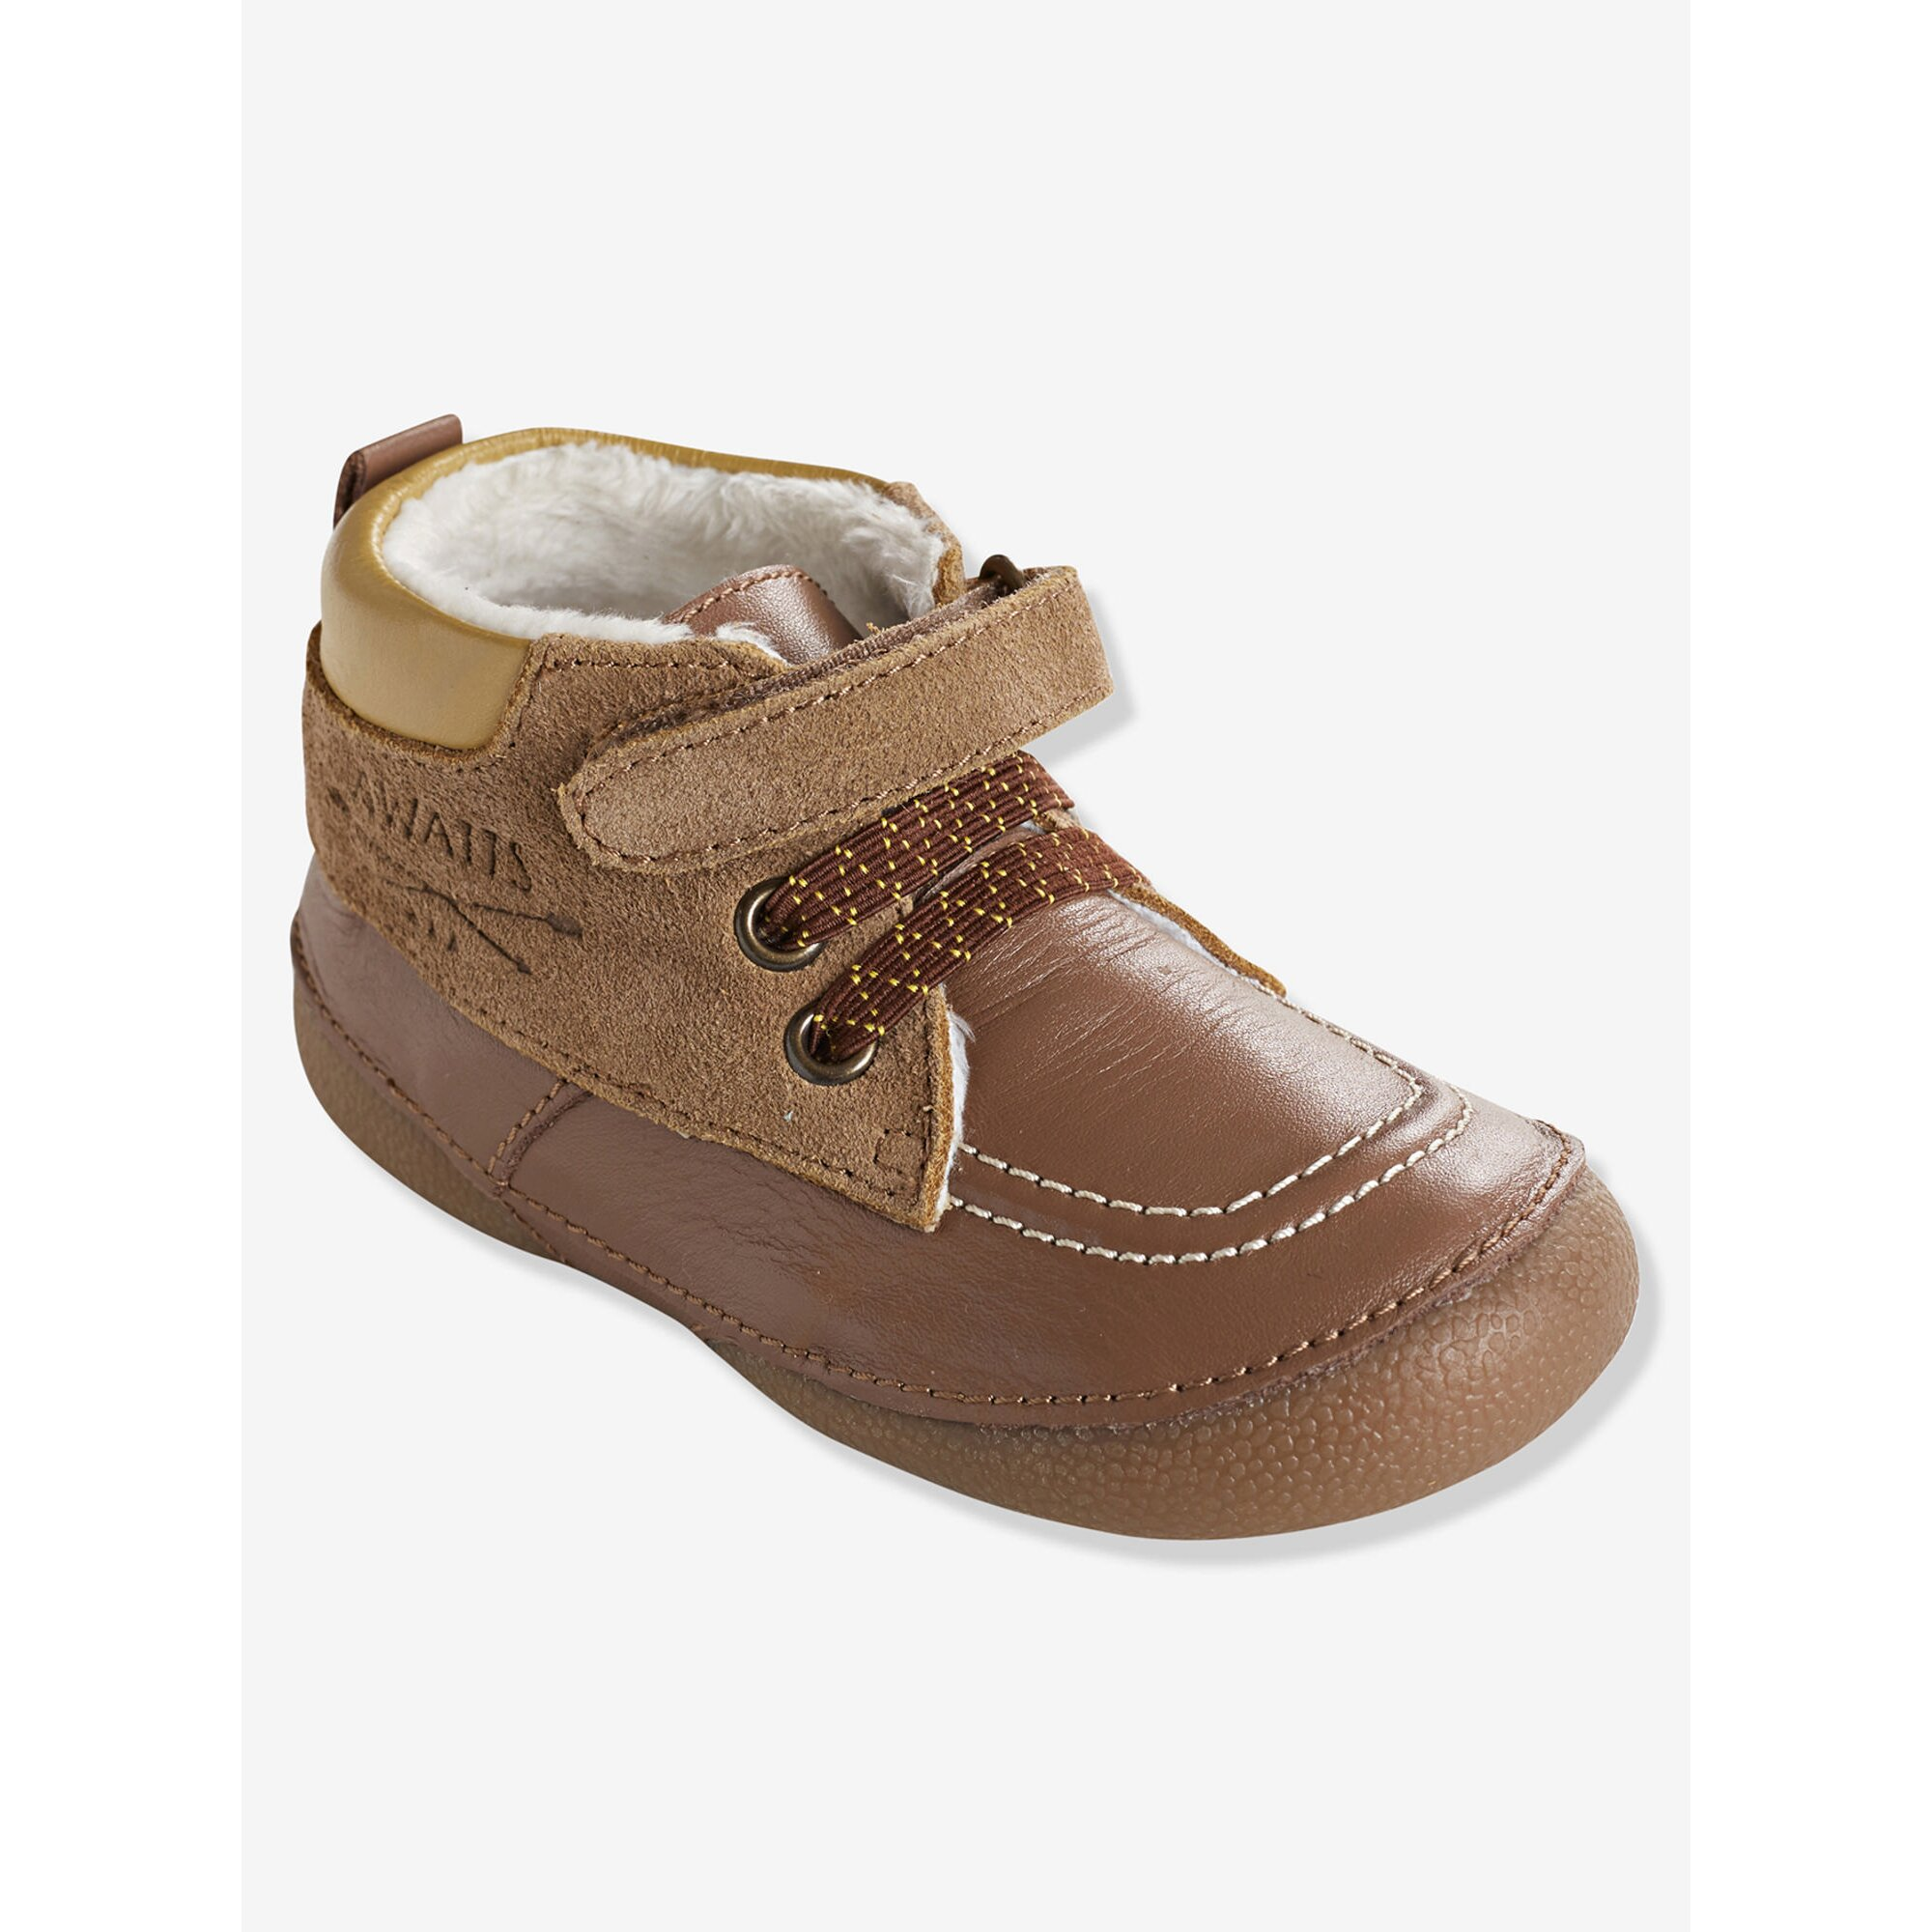 vertbaudet-lauflern-boots-fur-babys-gefuttert, 35.99 EUR @ babywalz-de